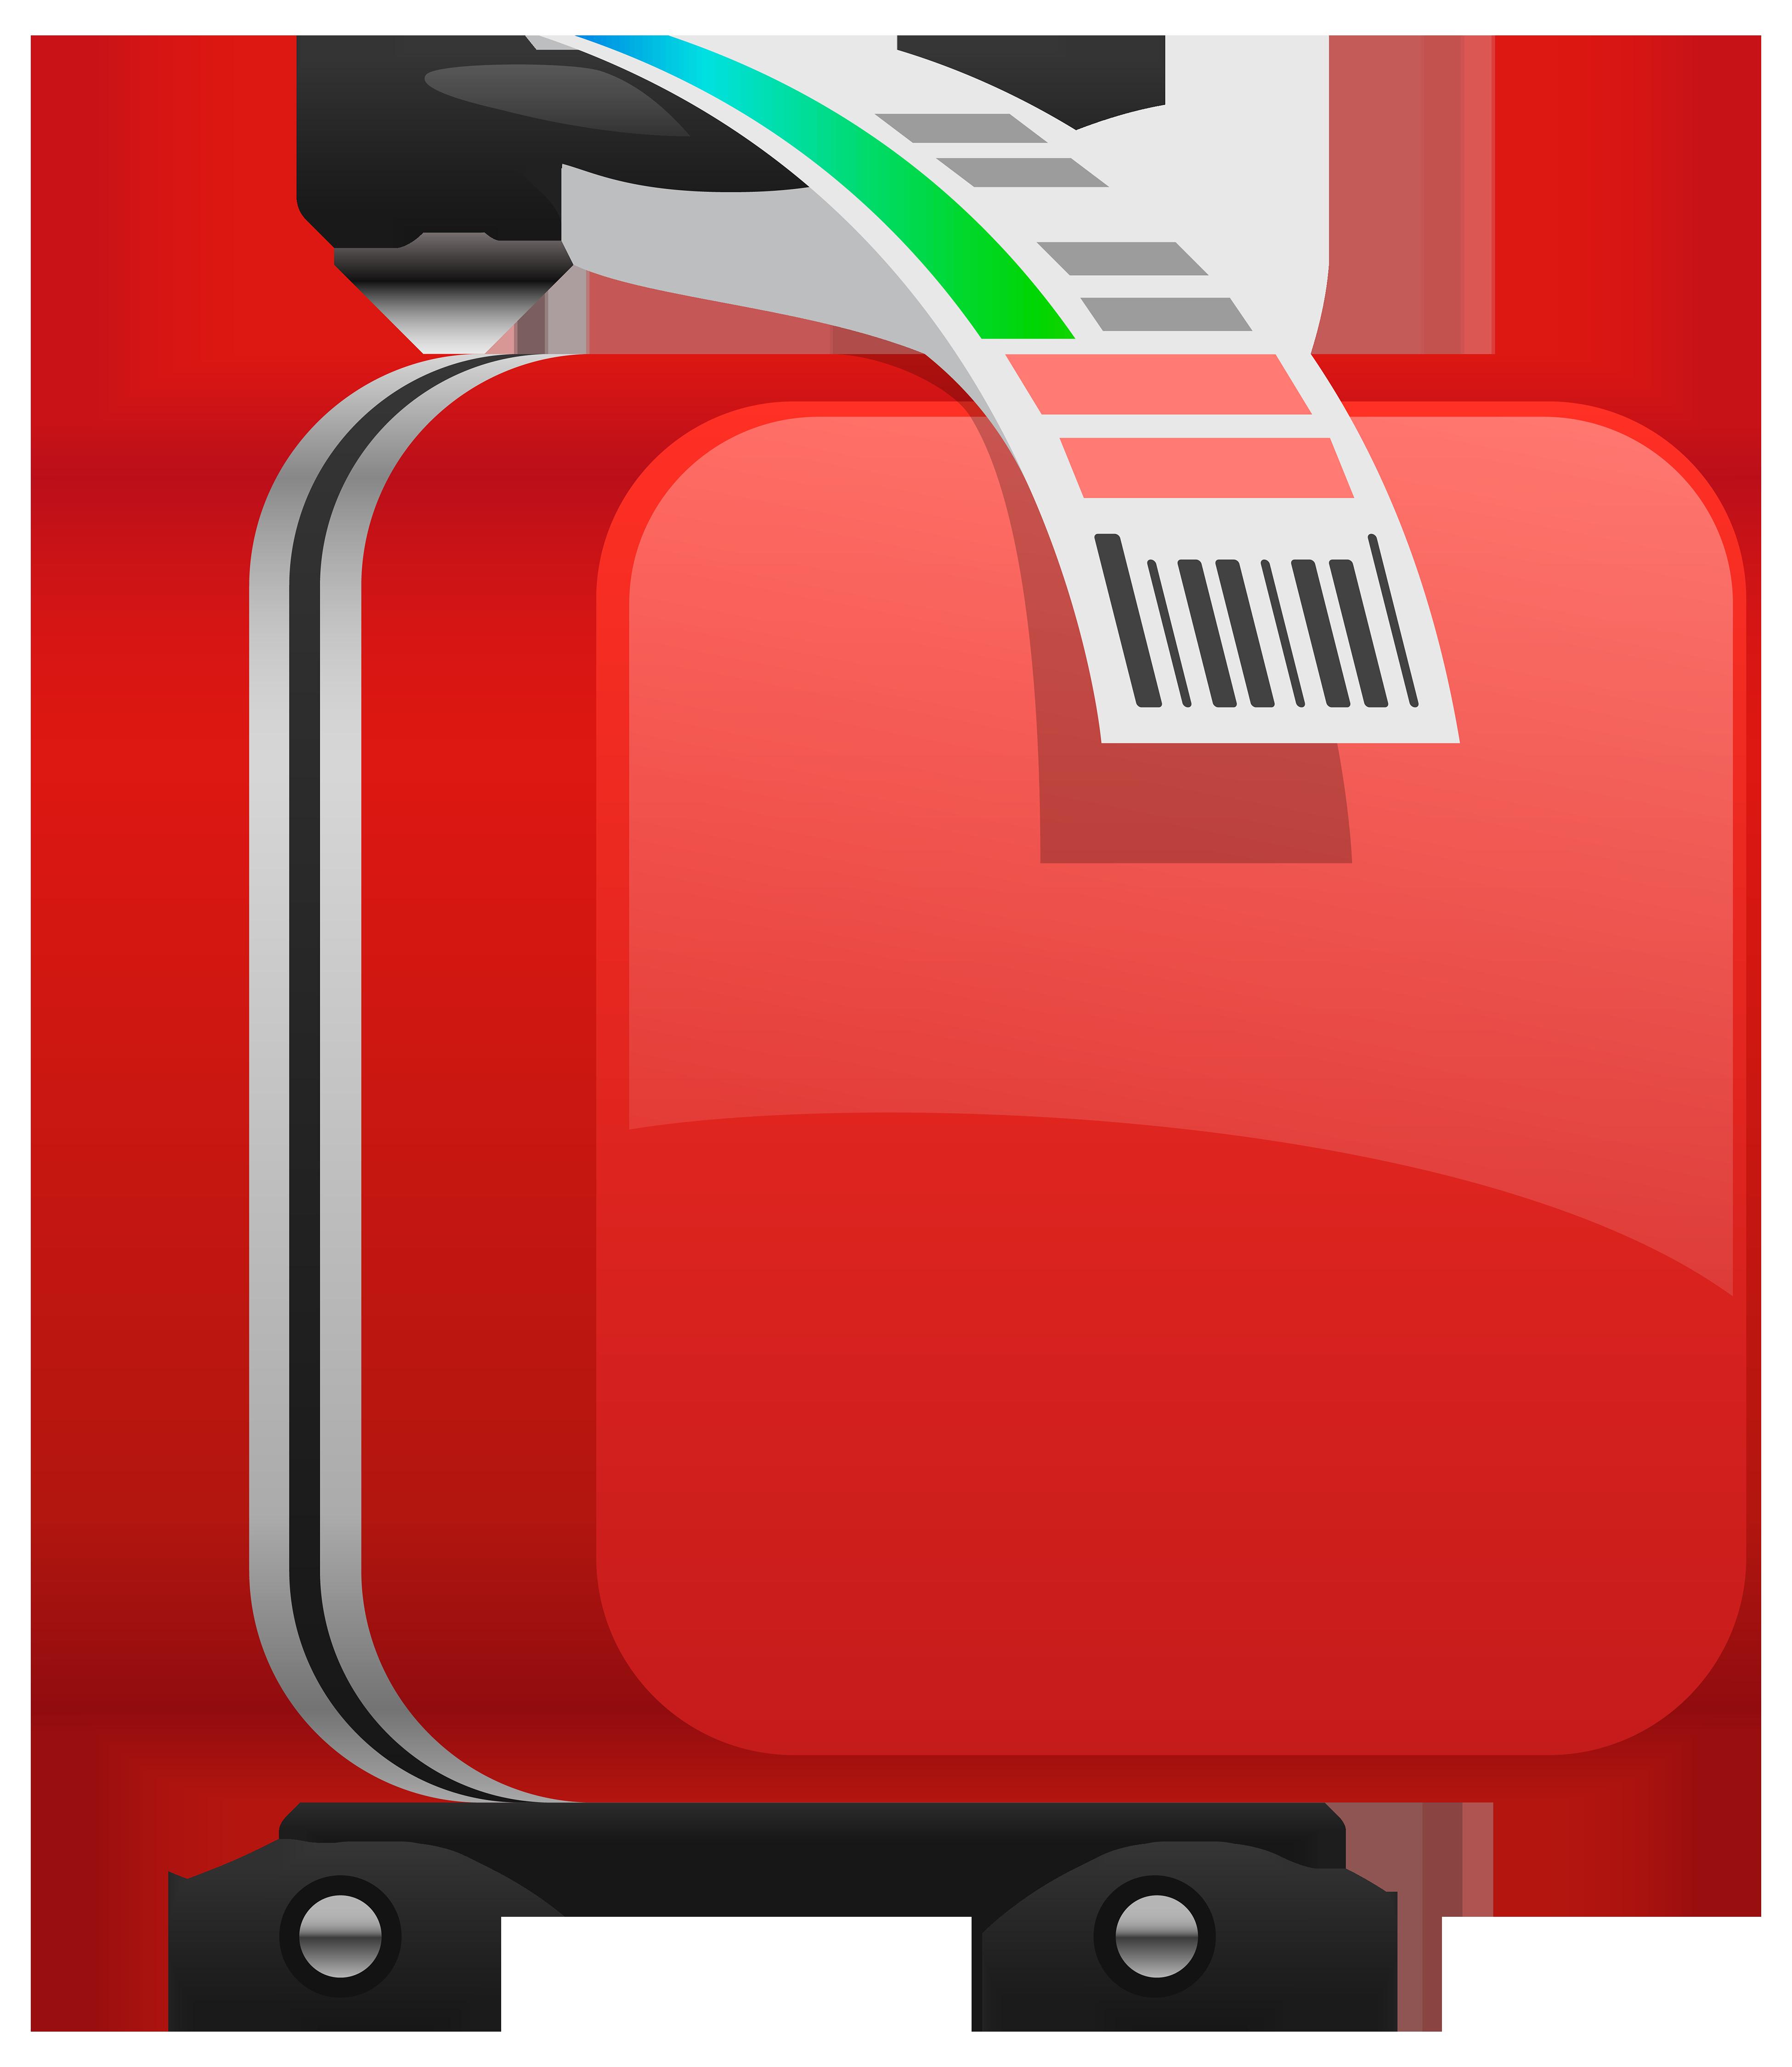 Suitcase clip art transparent. Luggage clipart international travel